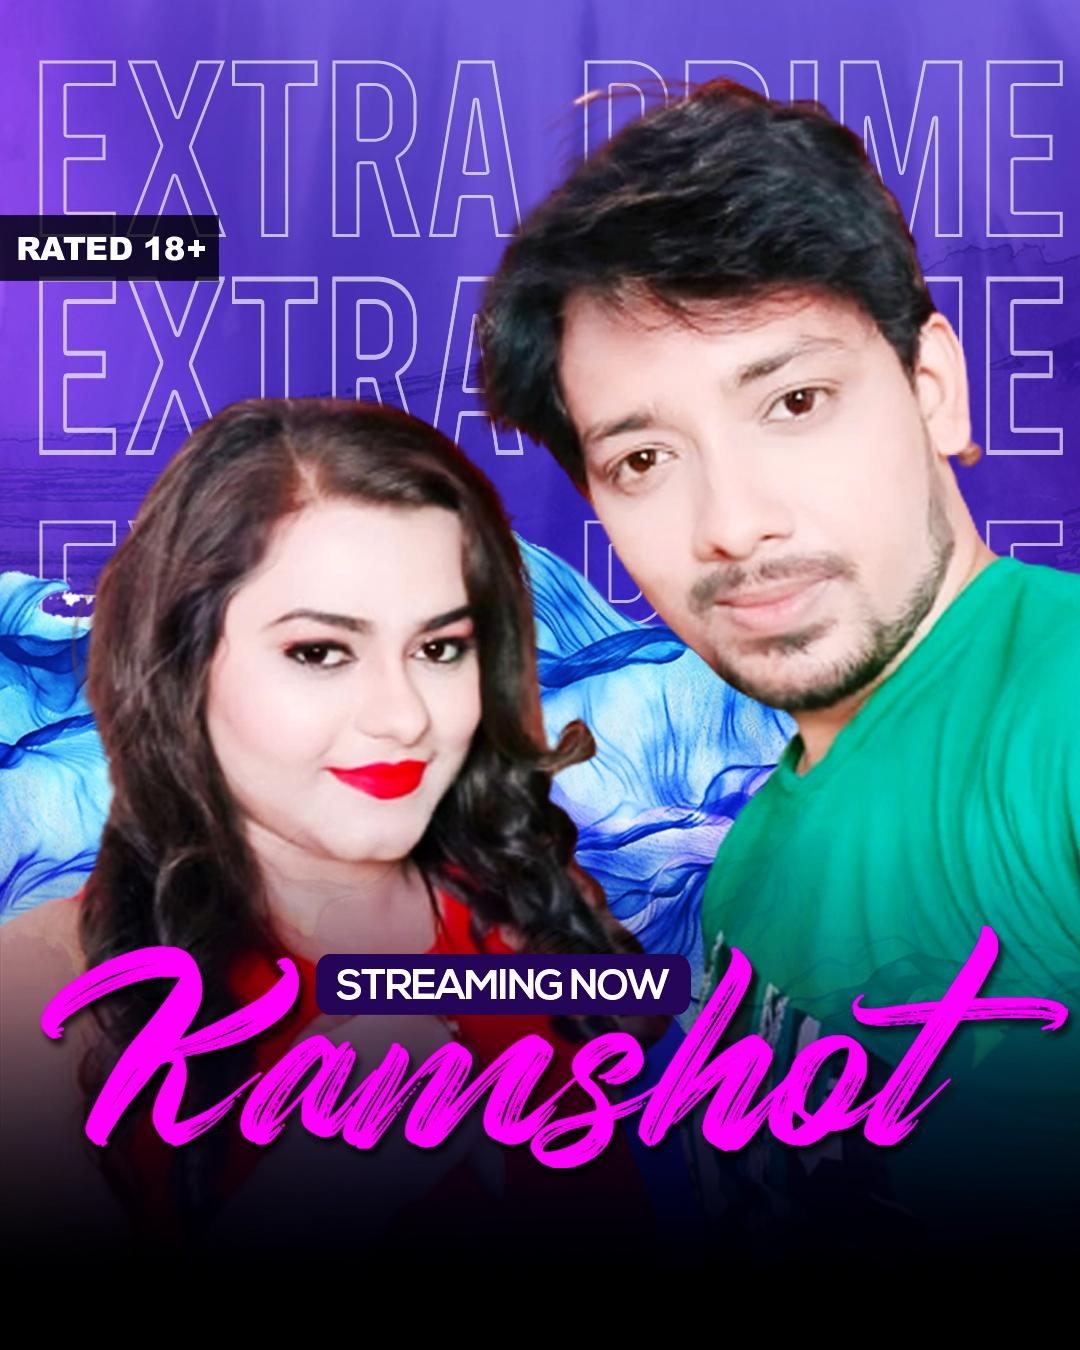 18+ KamShot 2021 ExtraPrime Originals Hindi Short Film 720p HDRip 130MB x264 AAC